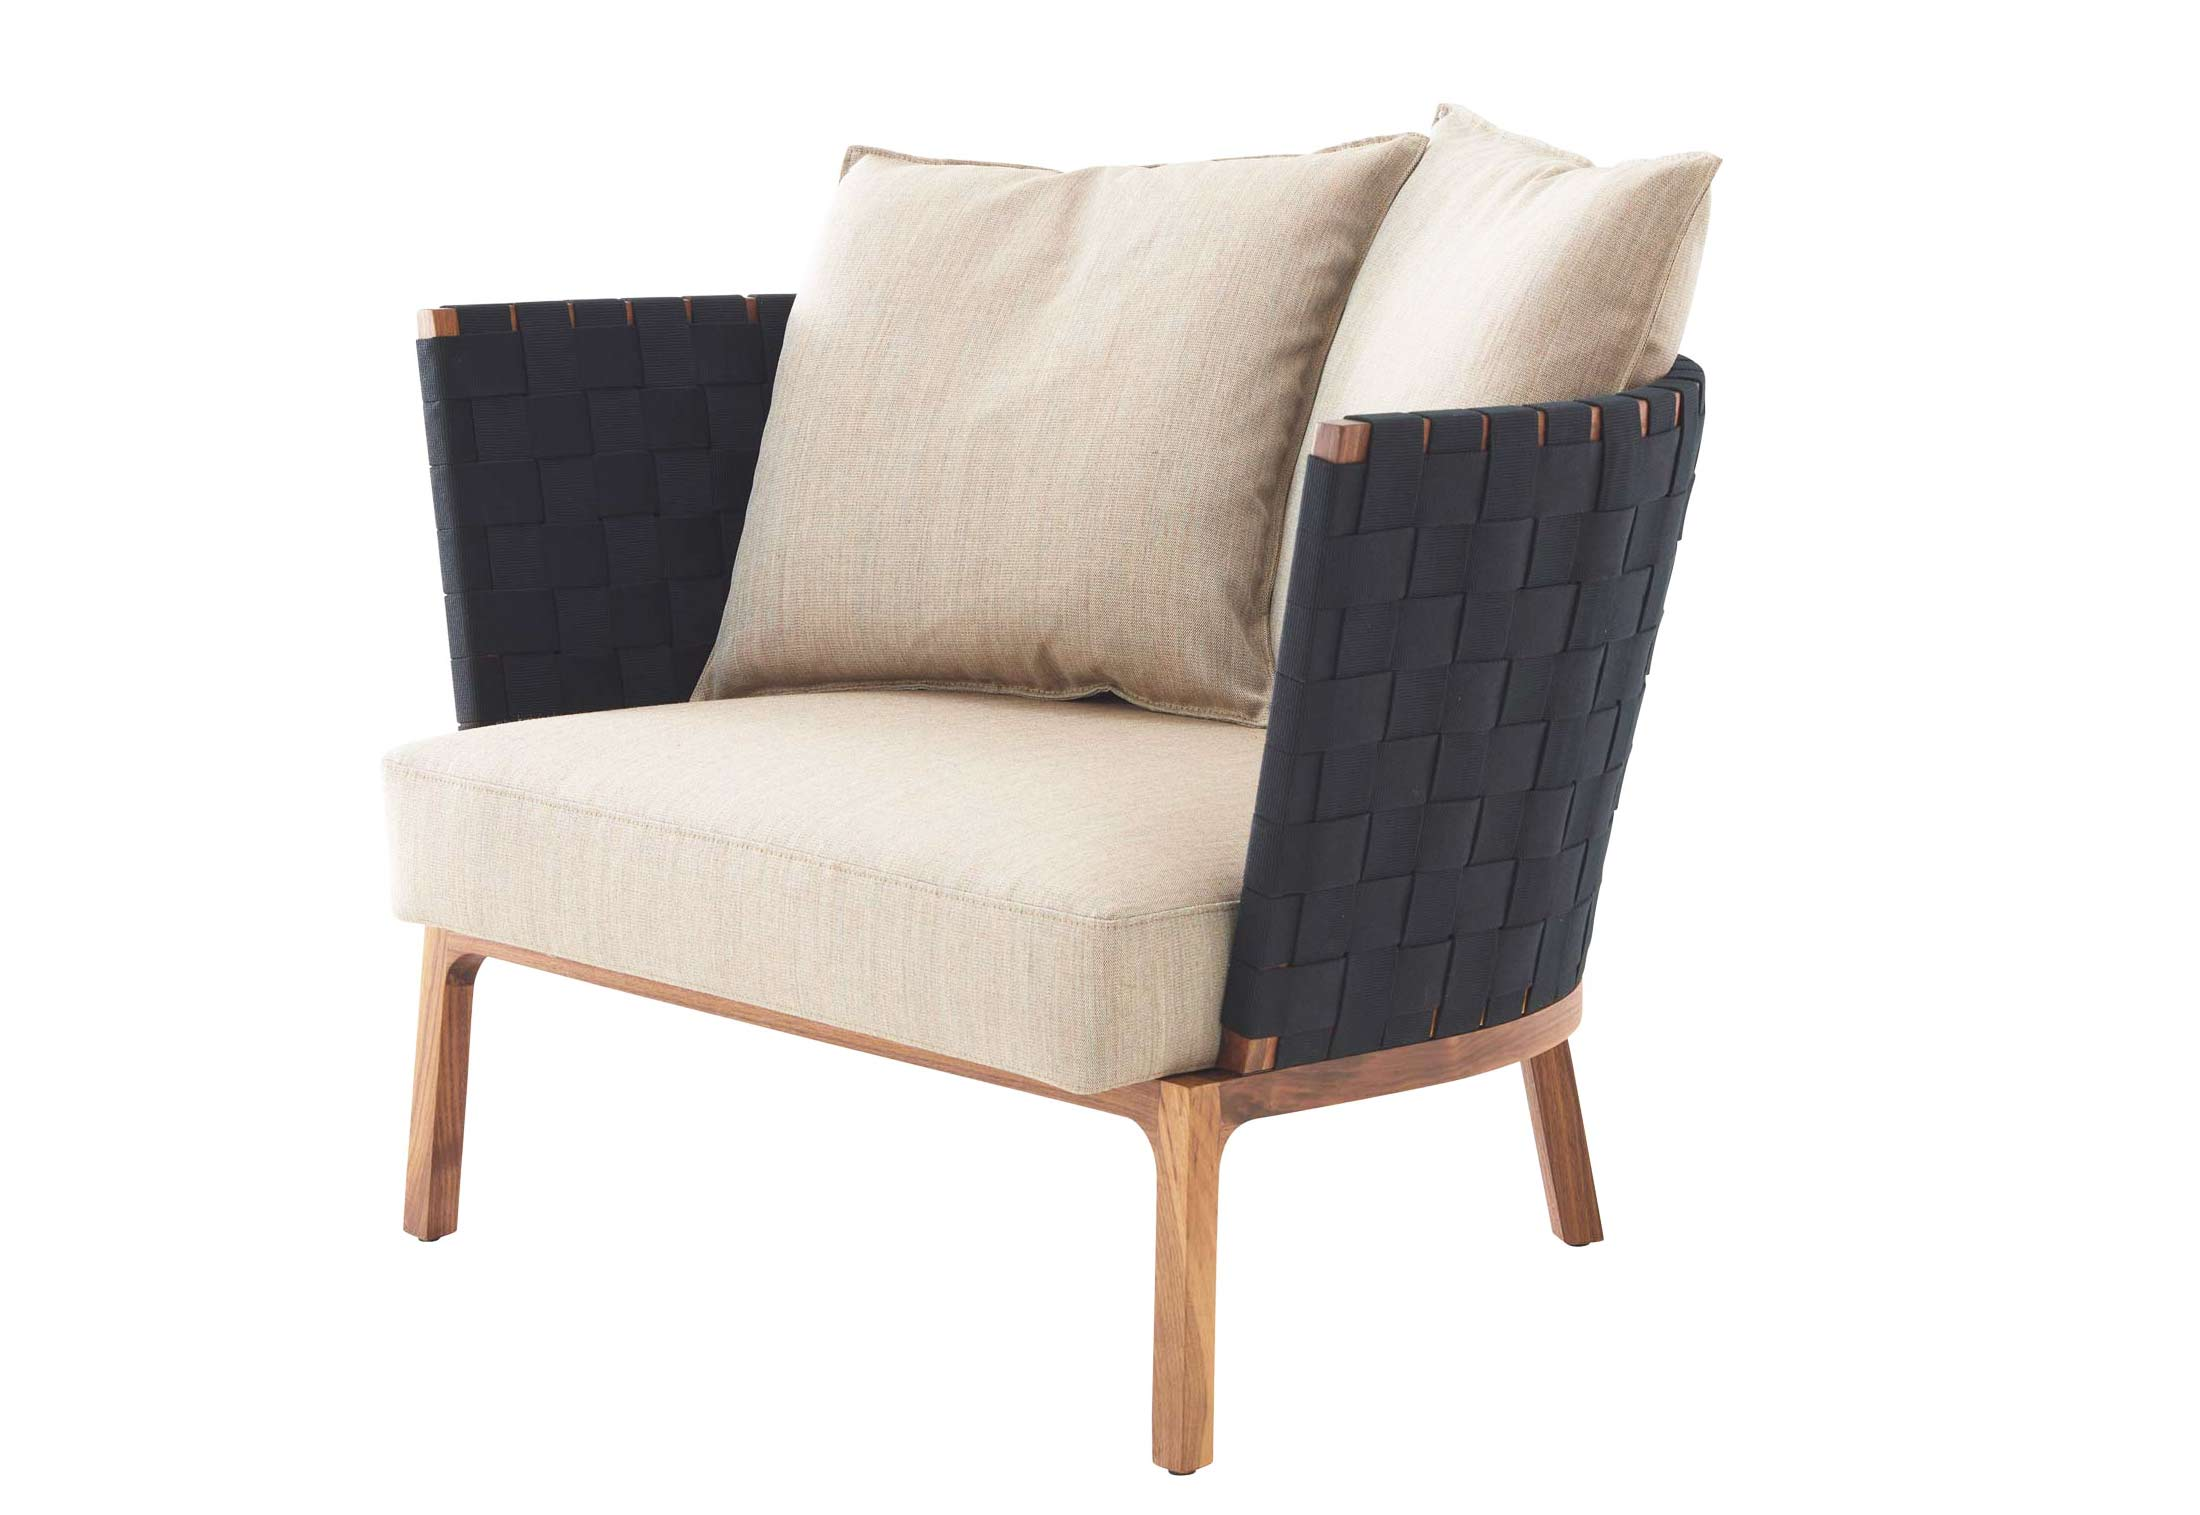 mon repos sessel von ligne roset stylepark. Black Bedroom Furniture Sets. Home Design Ideas